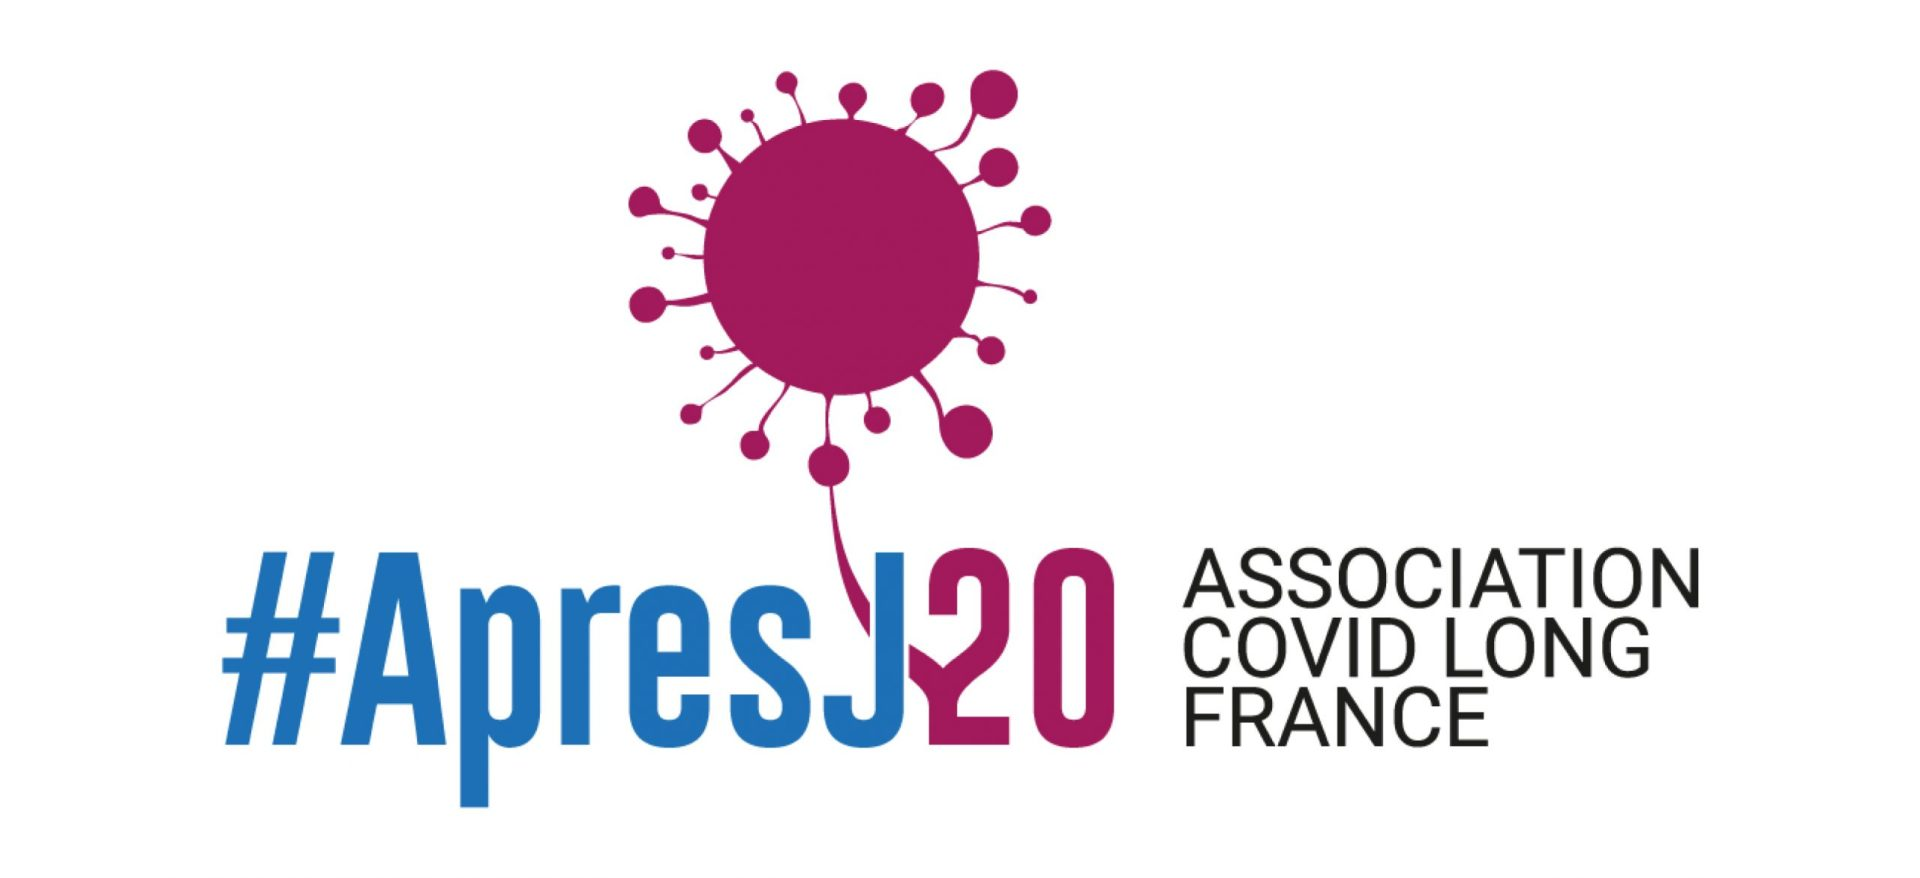 Association ApresJ20